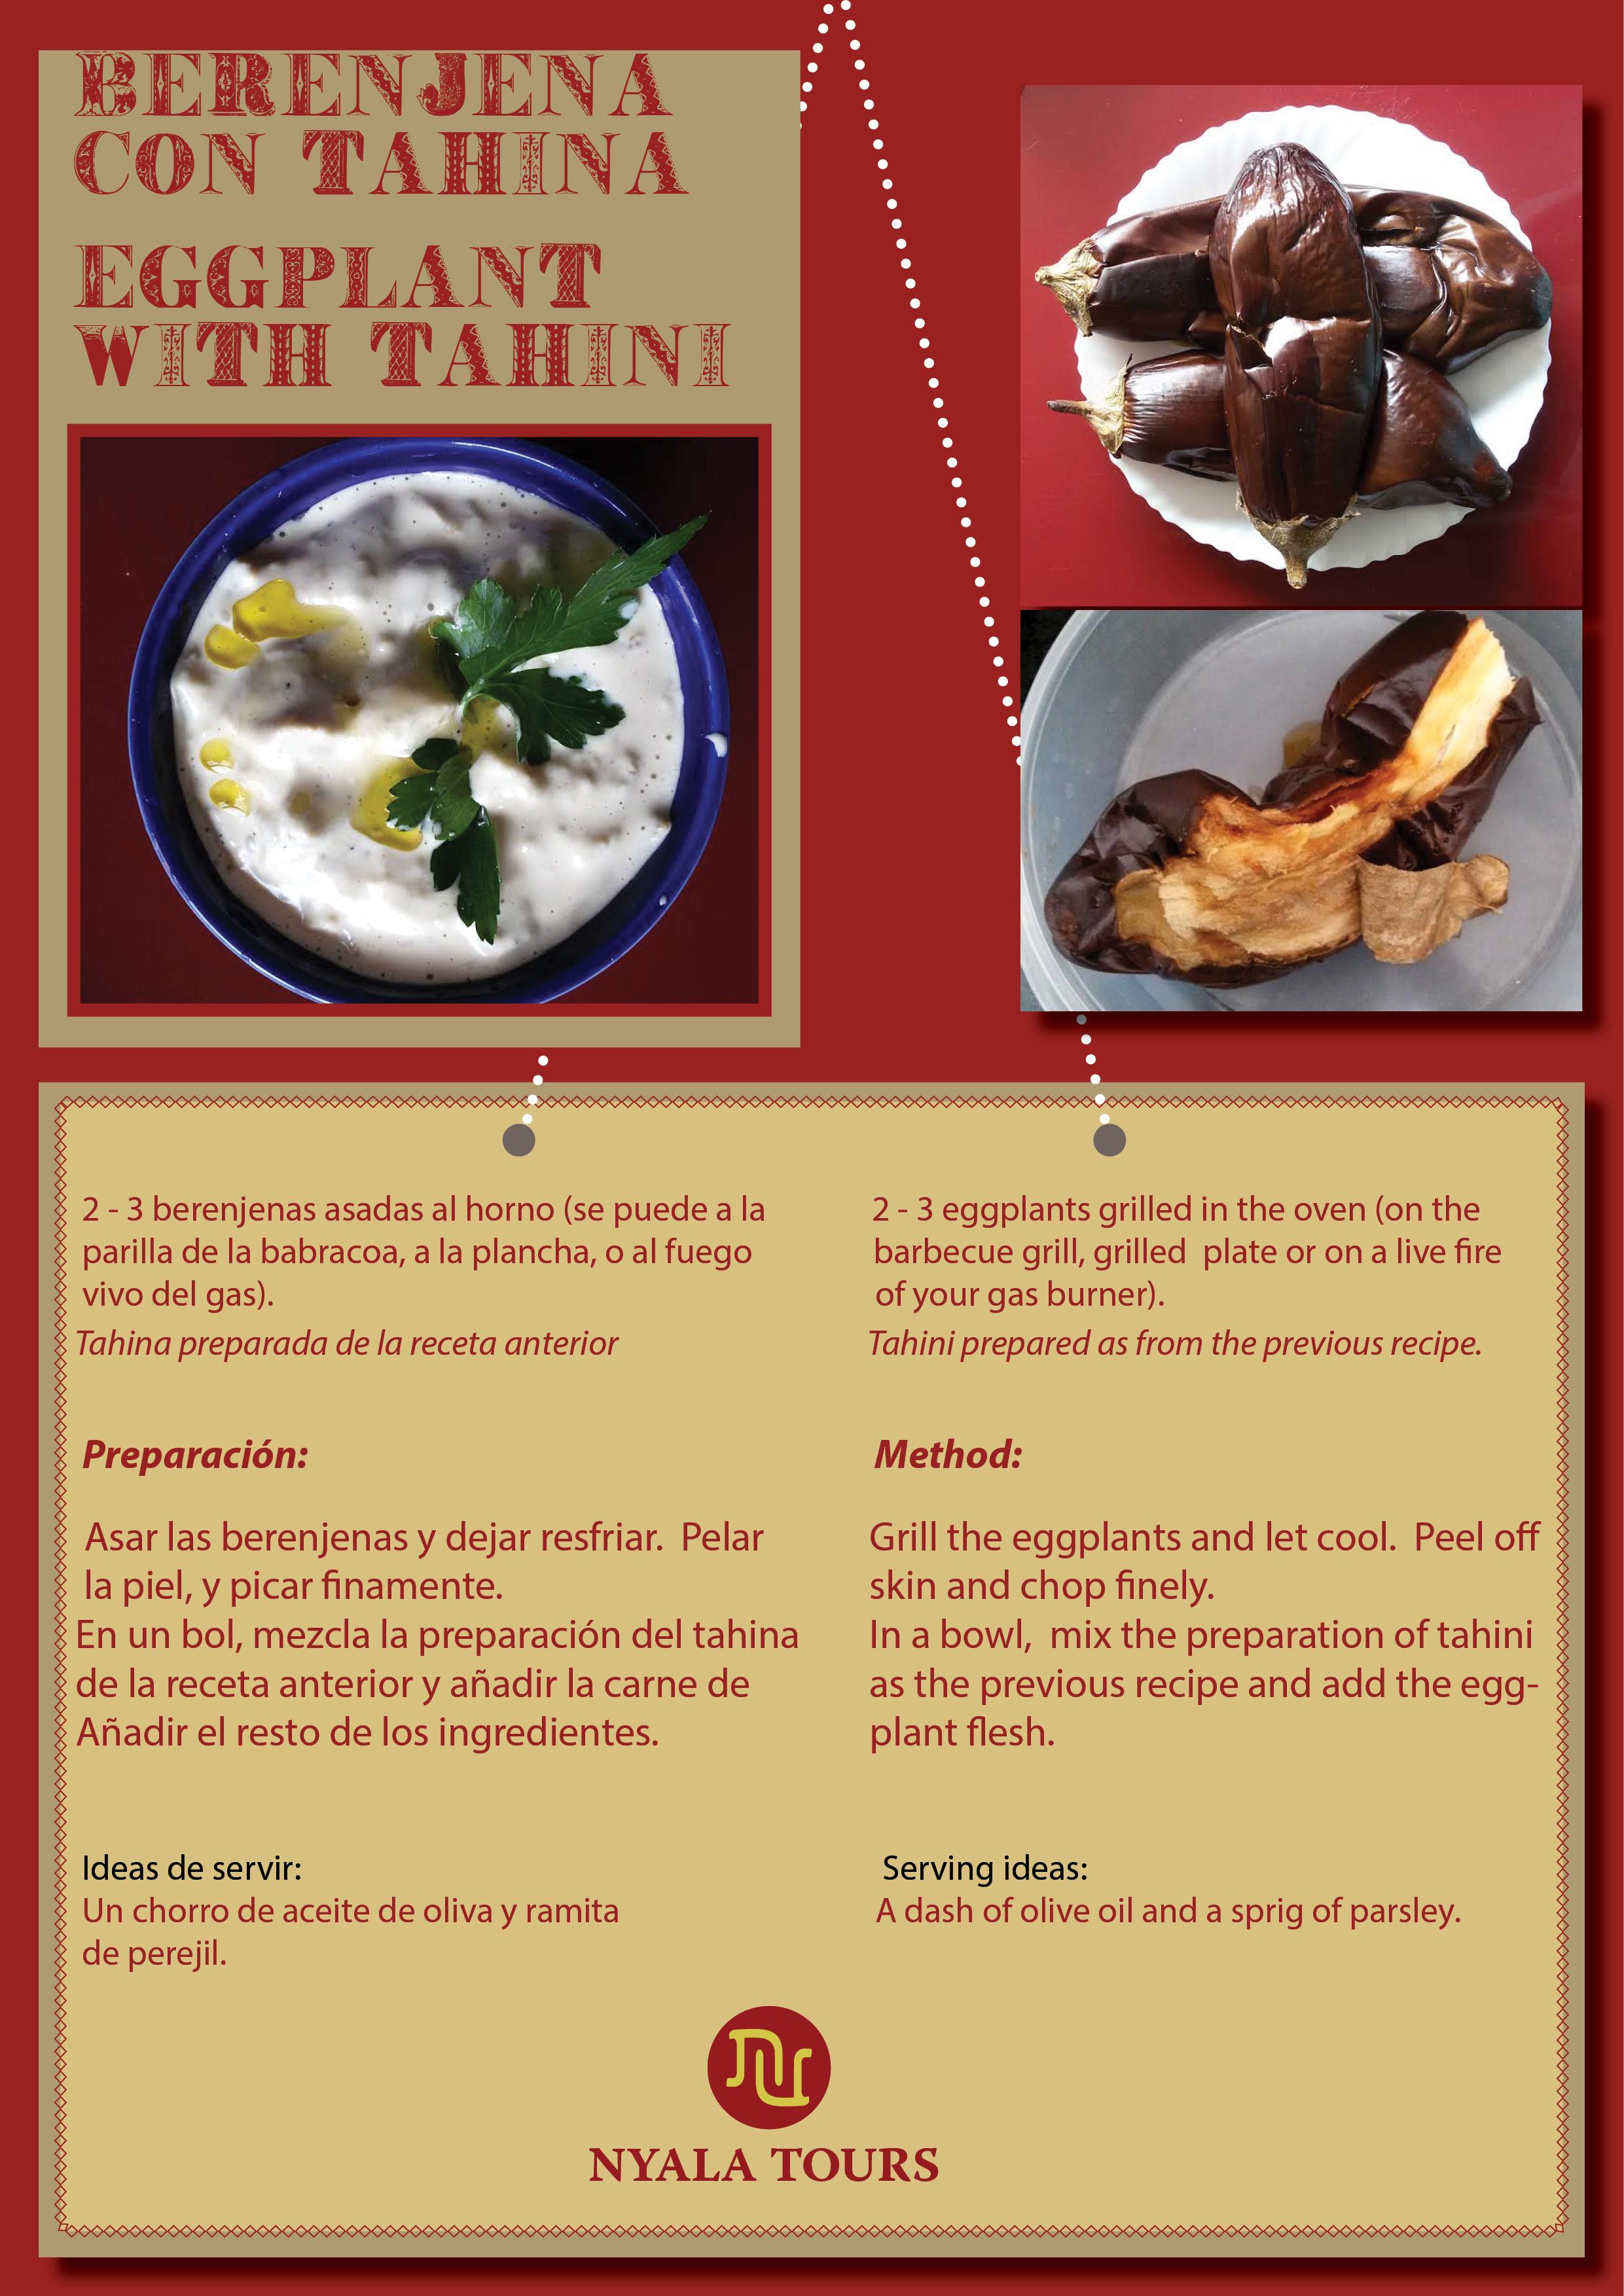 berenjenas con tahina recipe